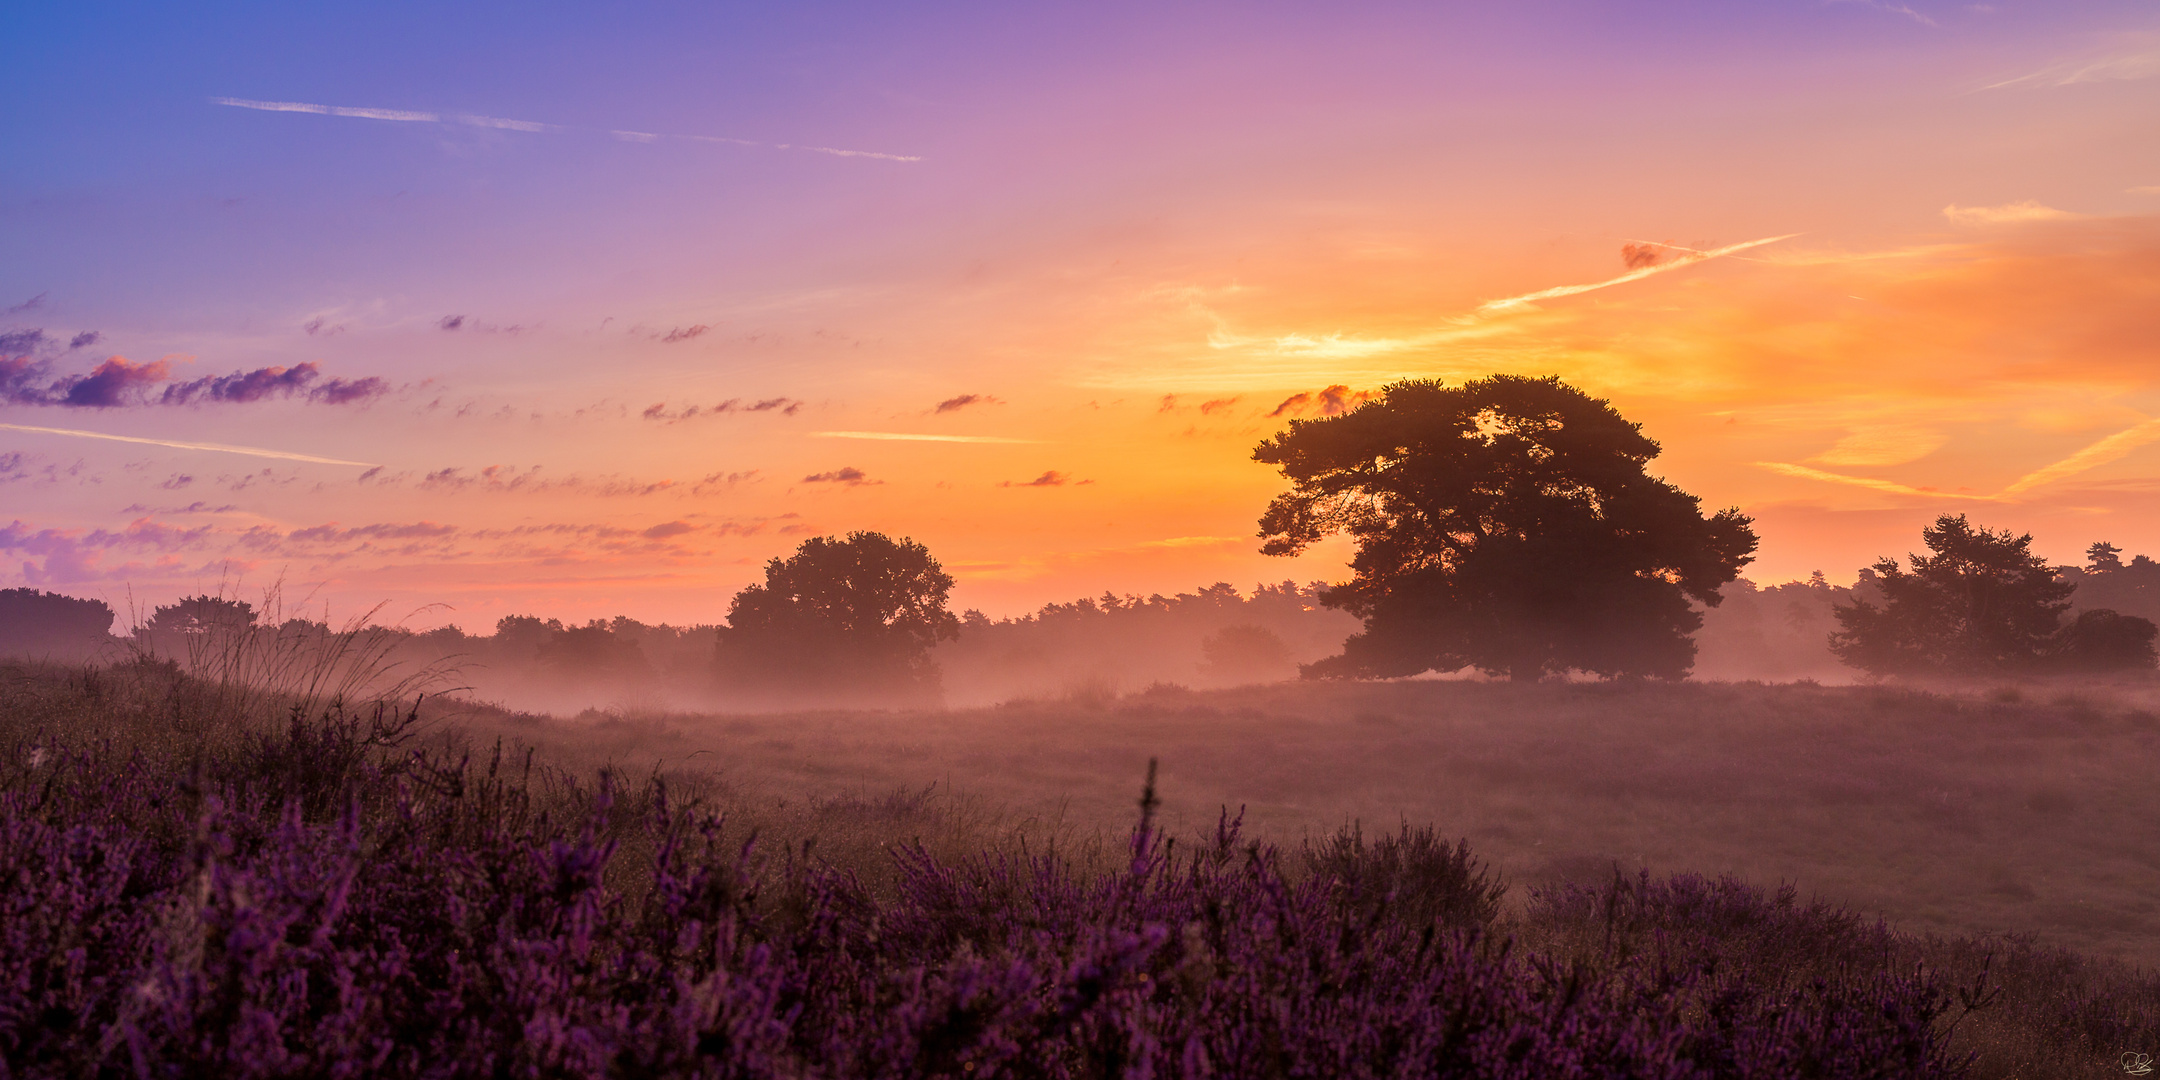 Westruper Heide vor Sonnenaufgang